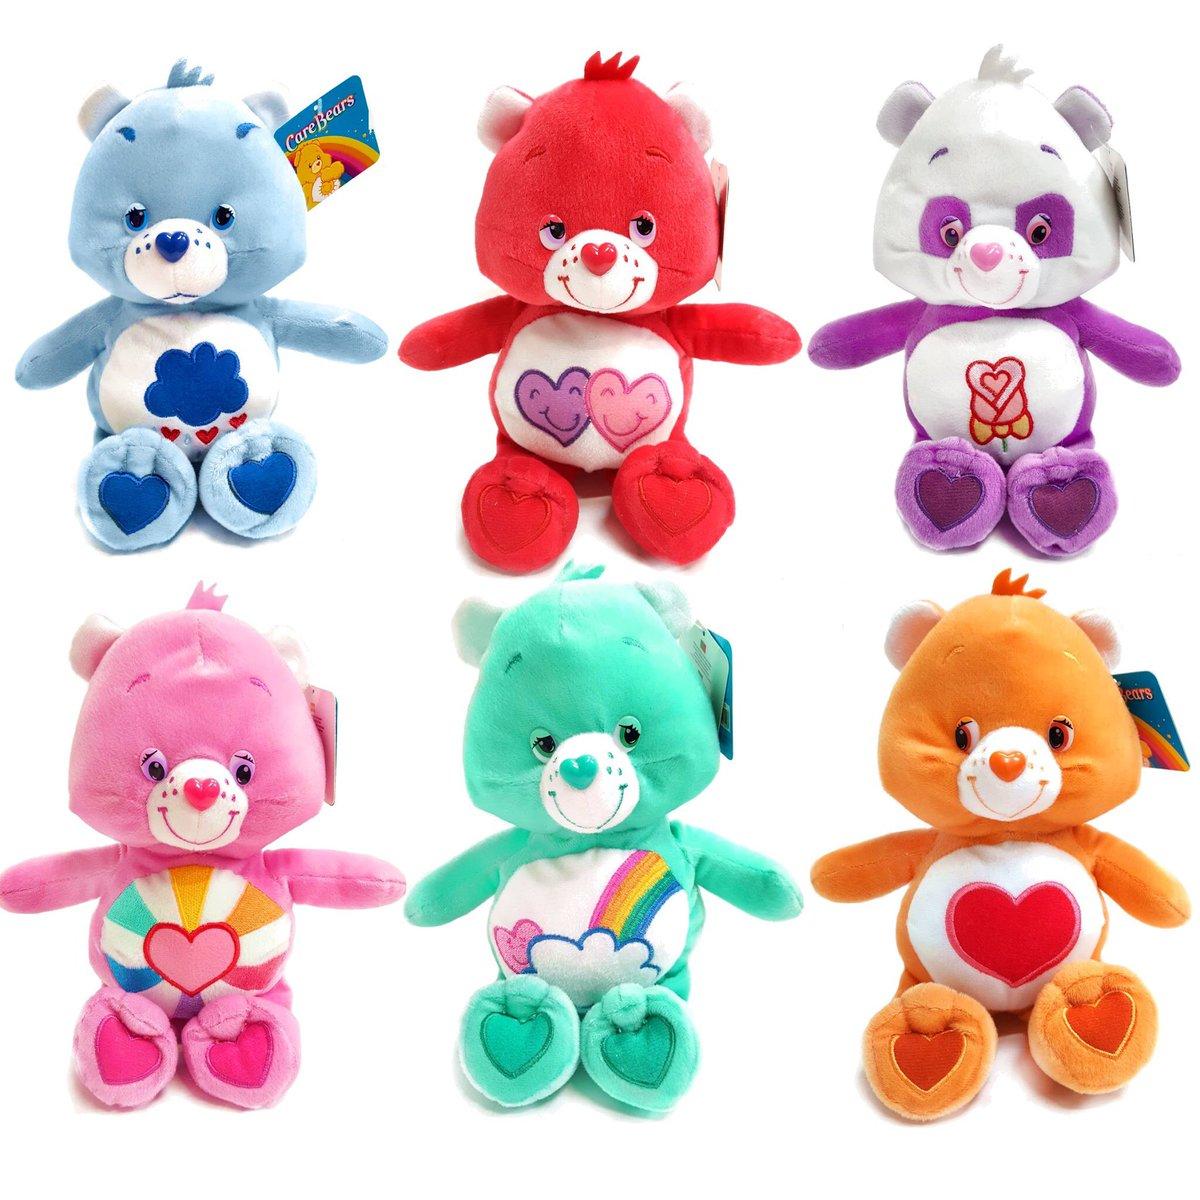 Blue Frog Toys On Twitter Care Bears Are Here For Christmas Https T Co Xvuqfpaf8h Carebears Toys Bizitalk Christmascountdown Christmas Giftideas Https T Co Owrlnvfemx